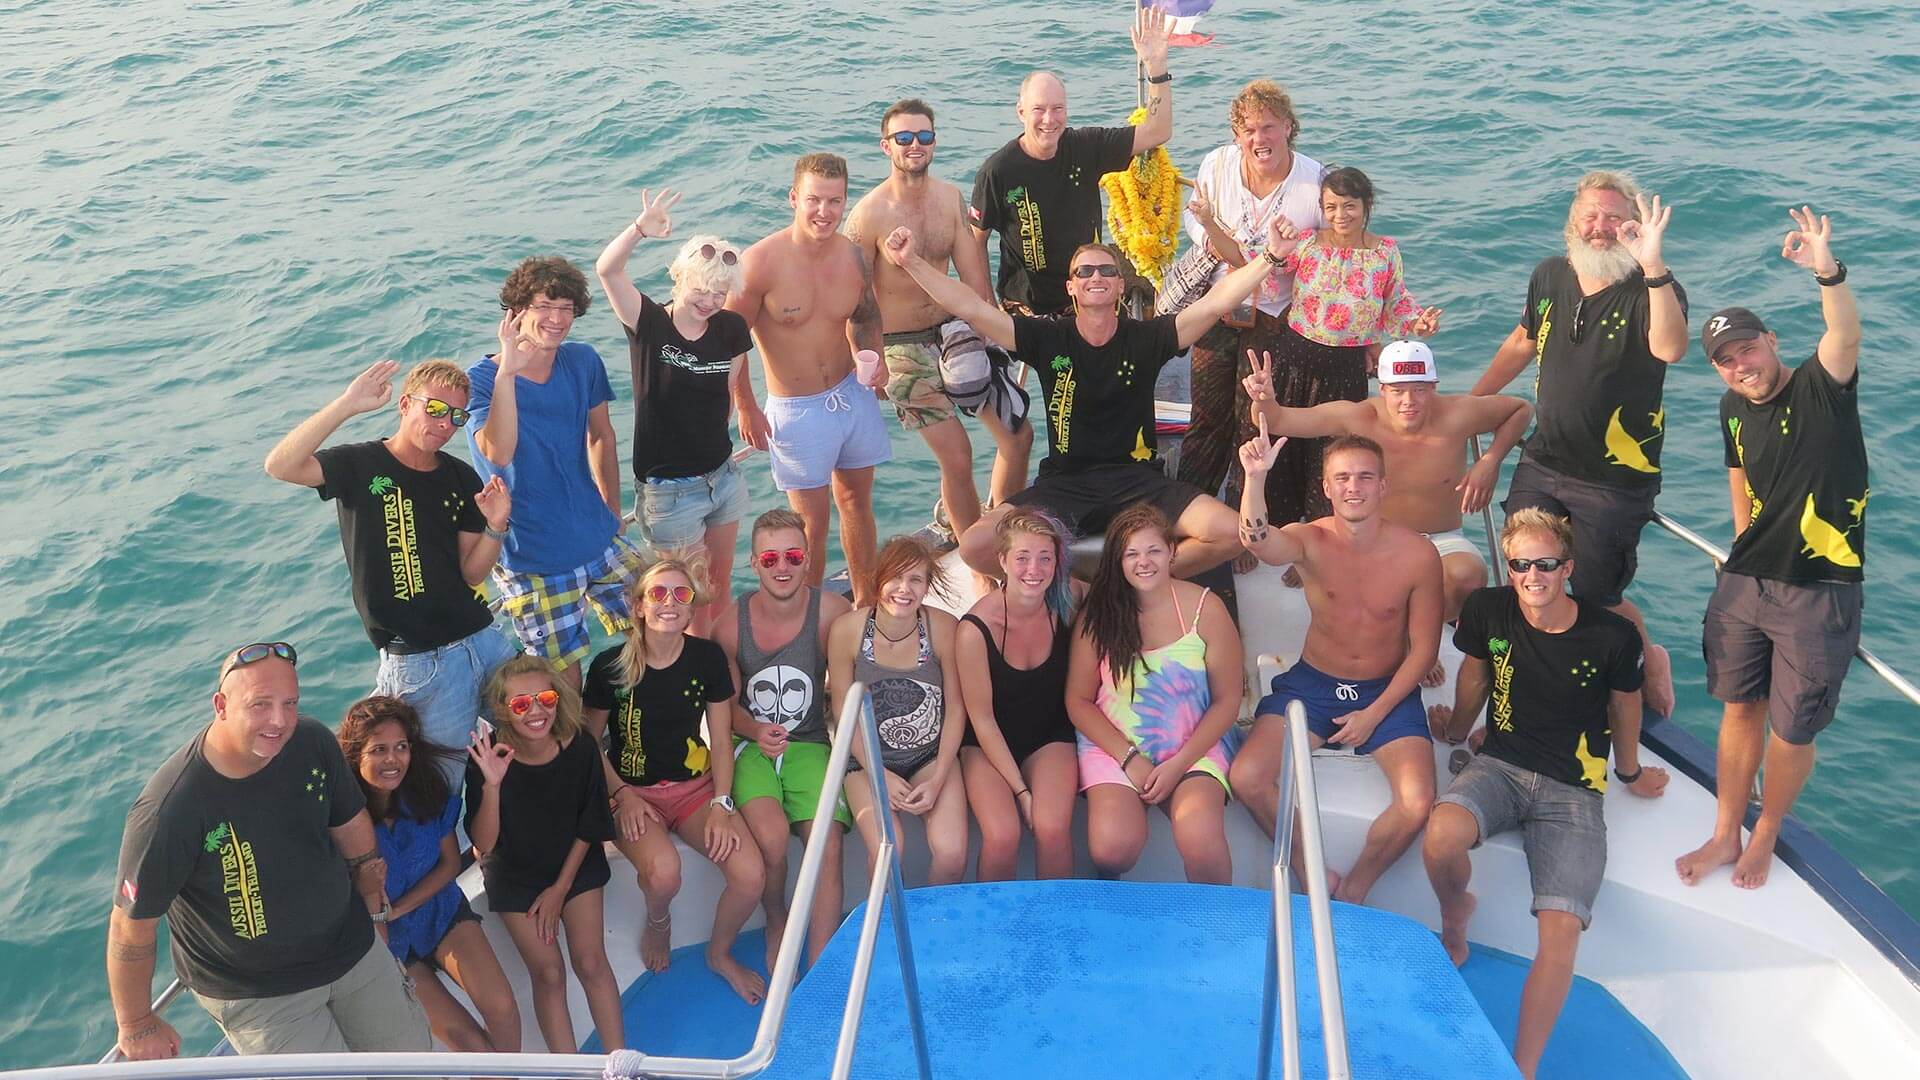 The Aussie Divers Mission